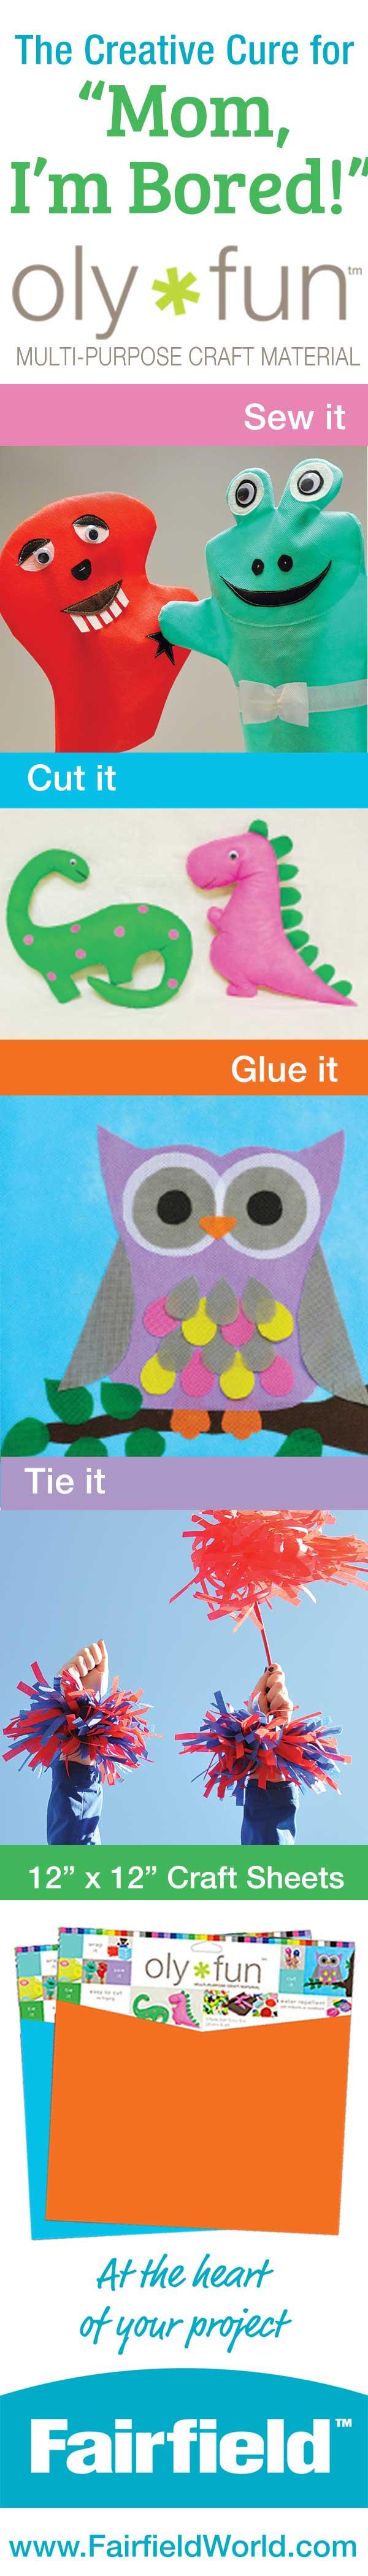 Olyfun craft ideas for pinterest